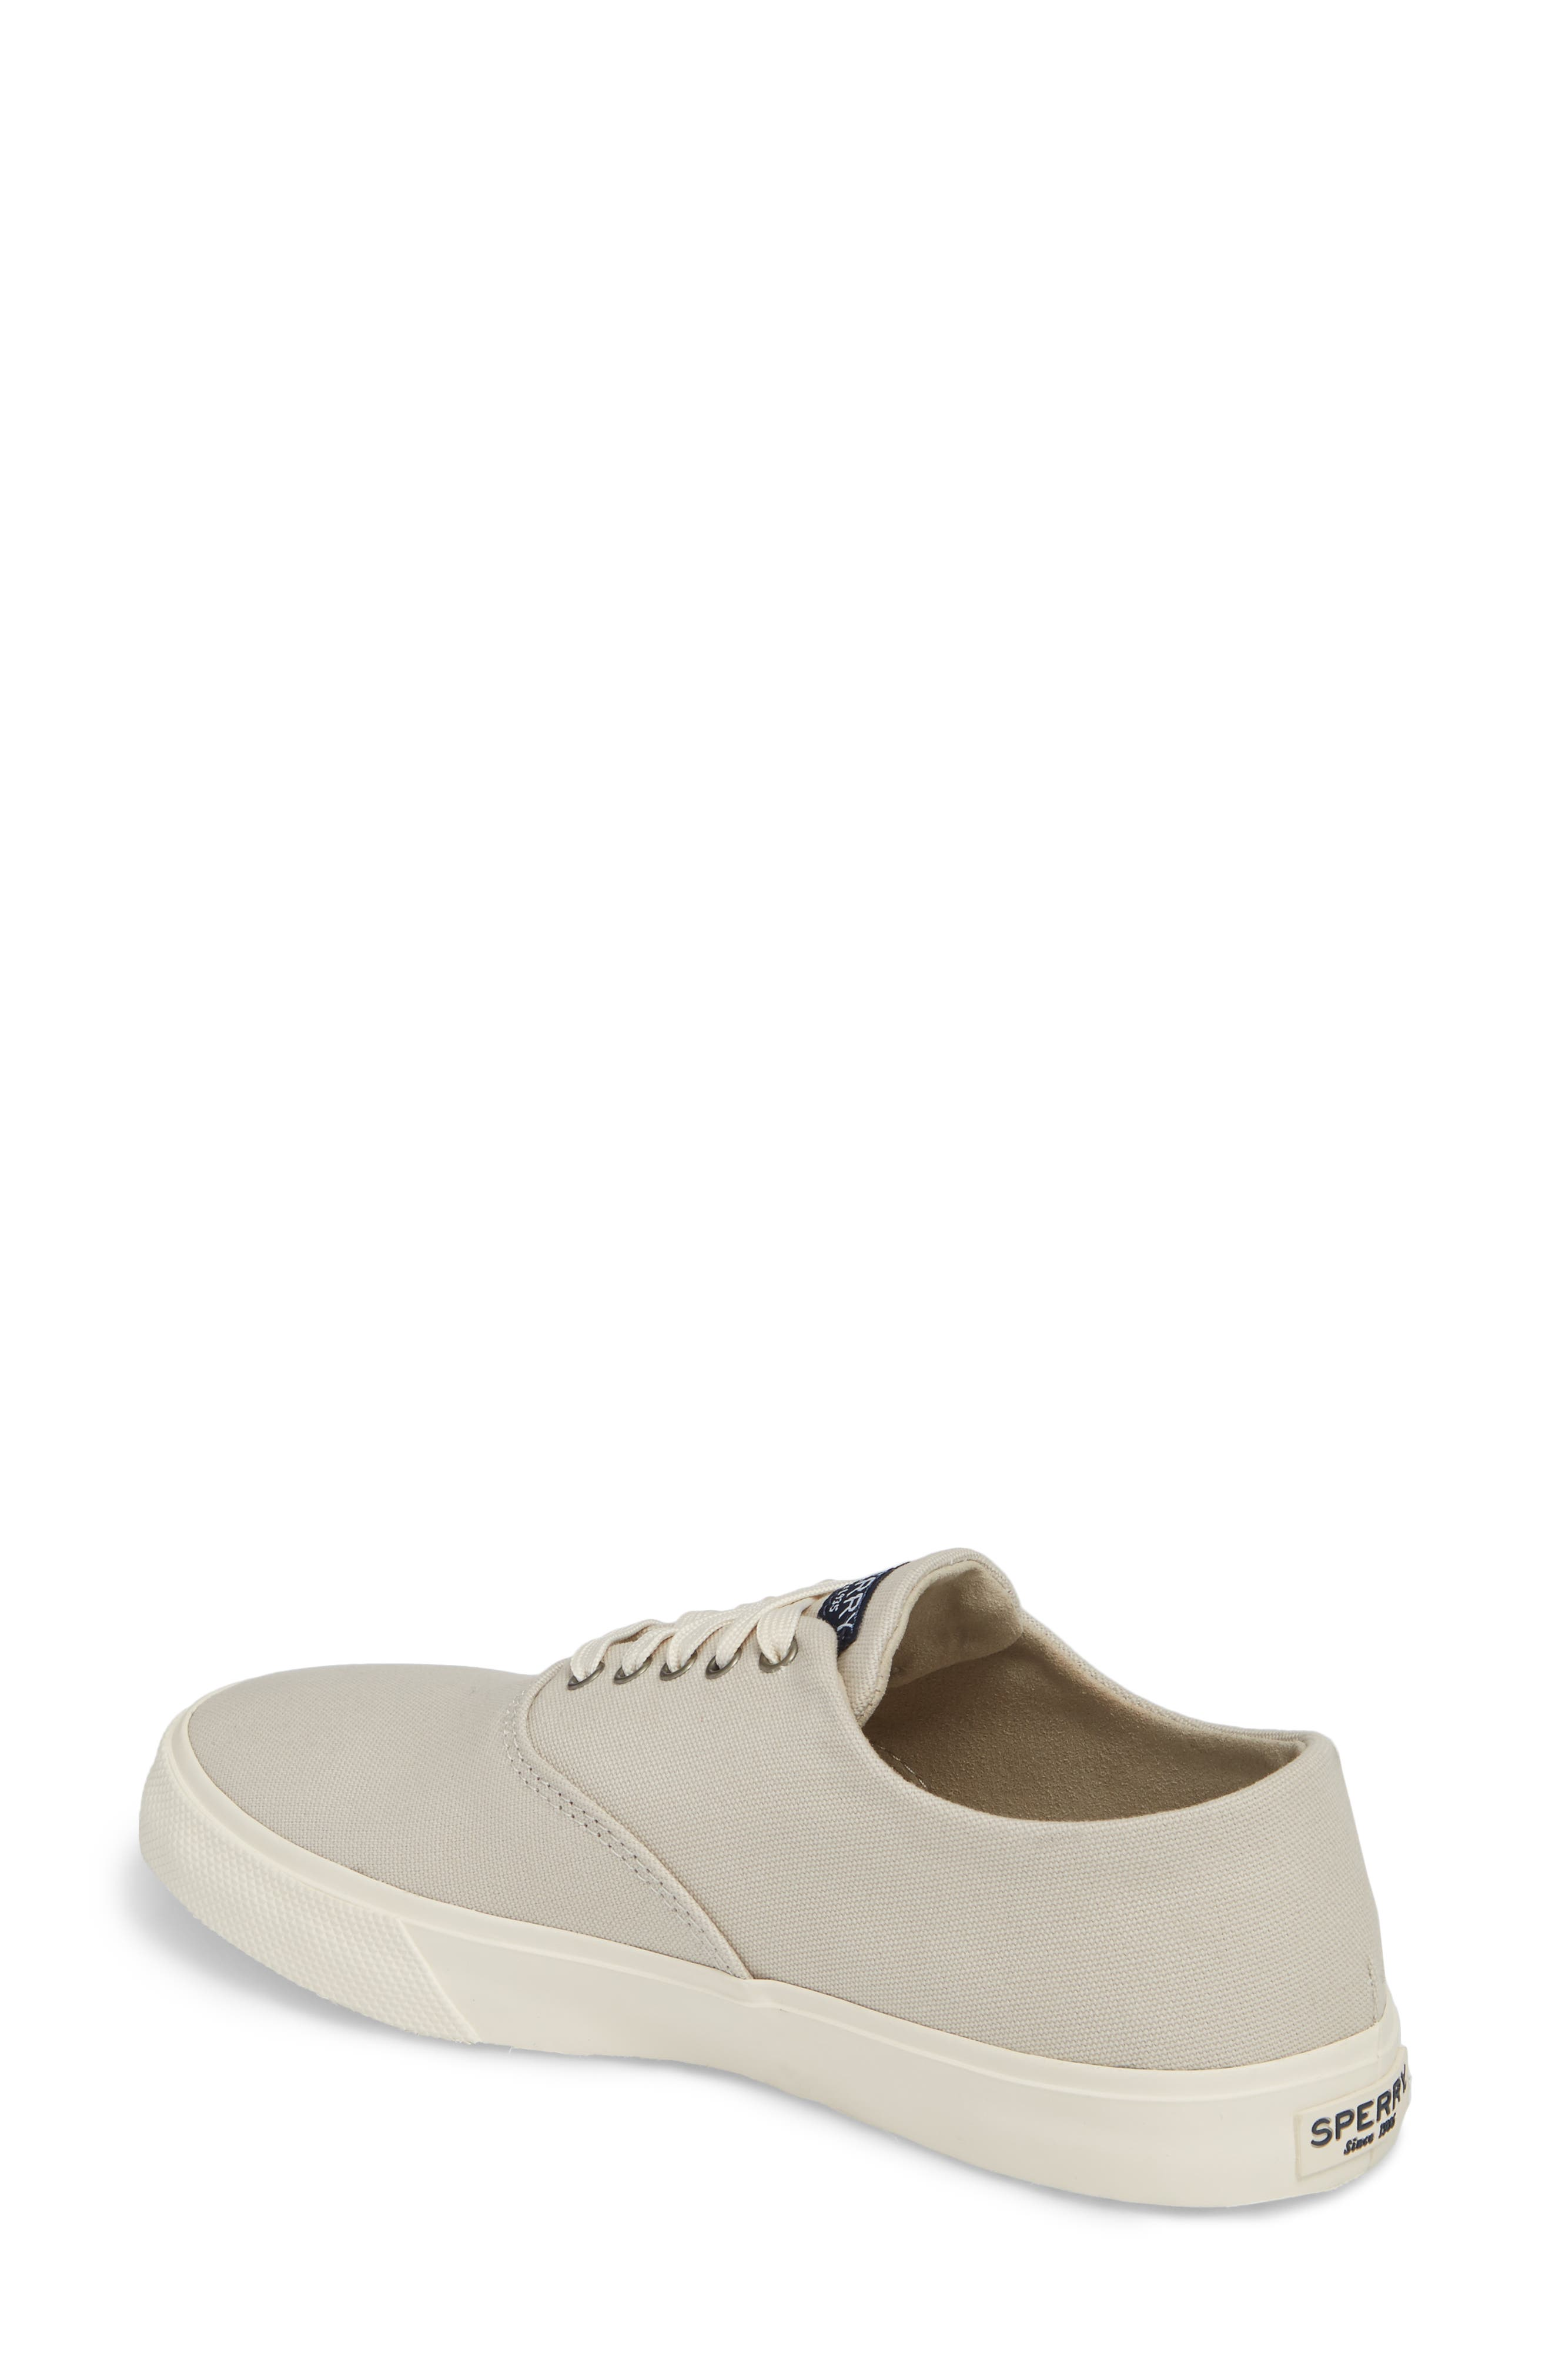 Captain's CVO Sneaker,                             Alternate thumbnail 2, color,                             050